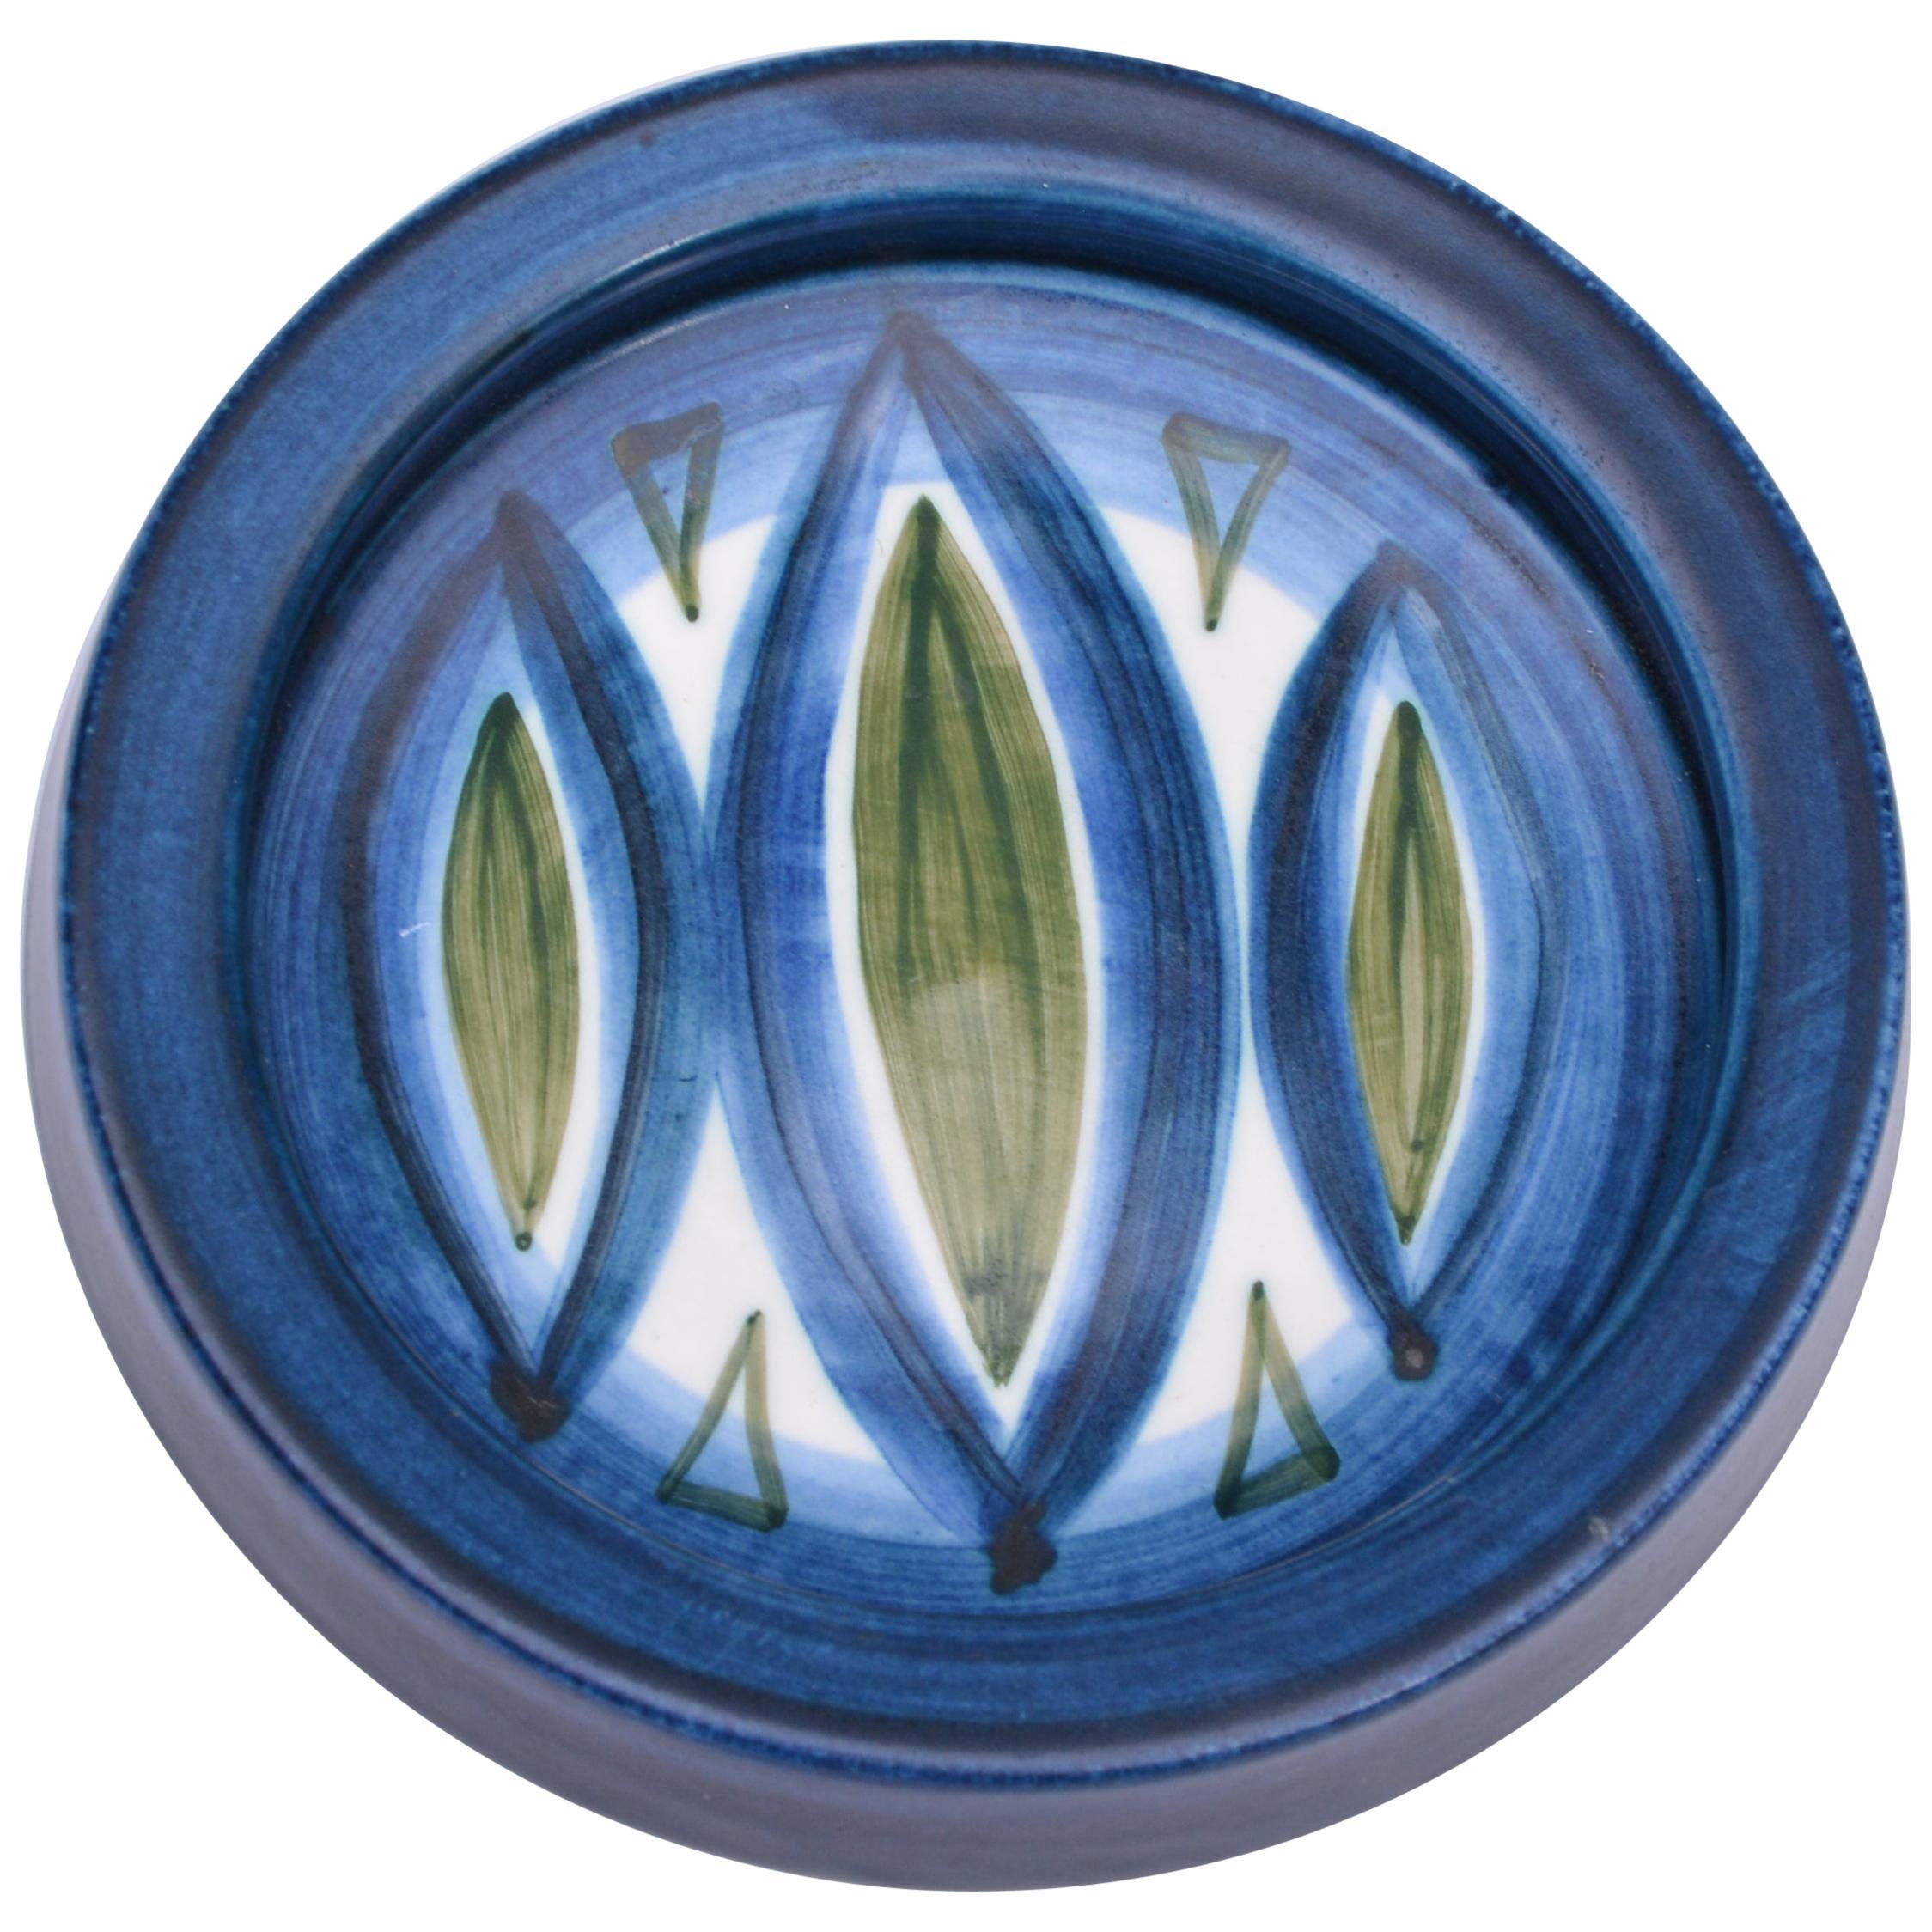 Small Ceramic Bowl by Günter and Waltraud Praschak for Knabstrup, 1960s